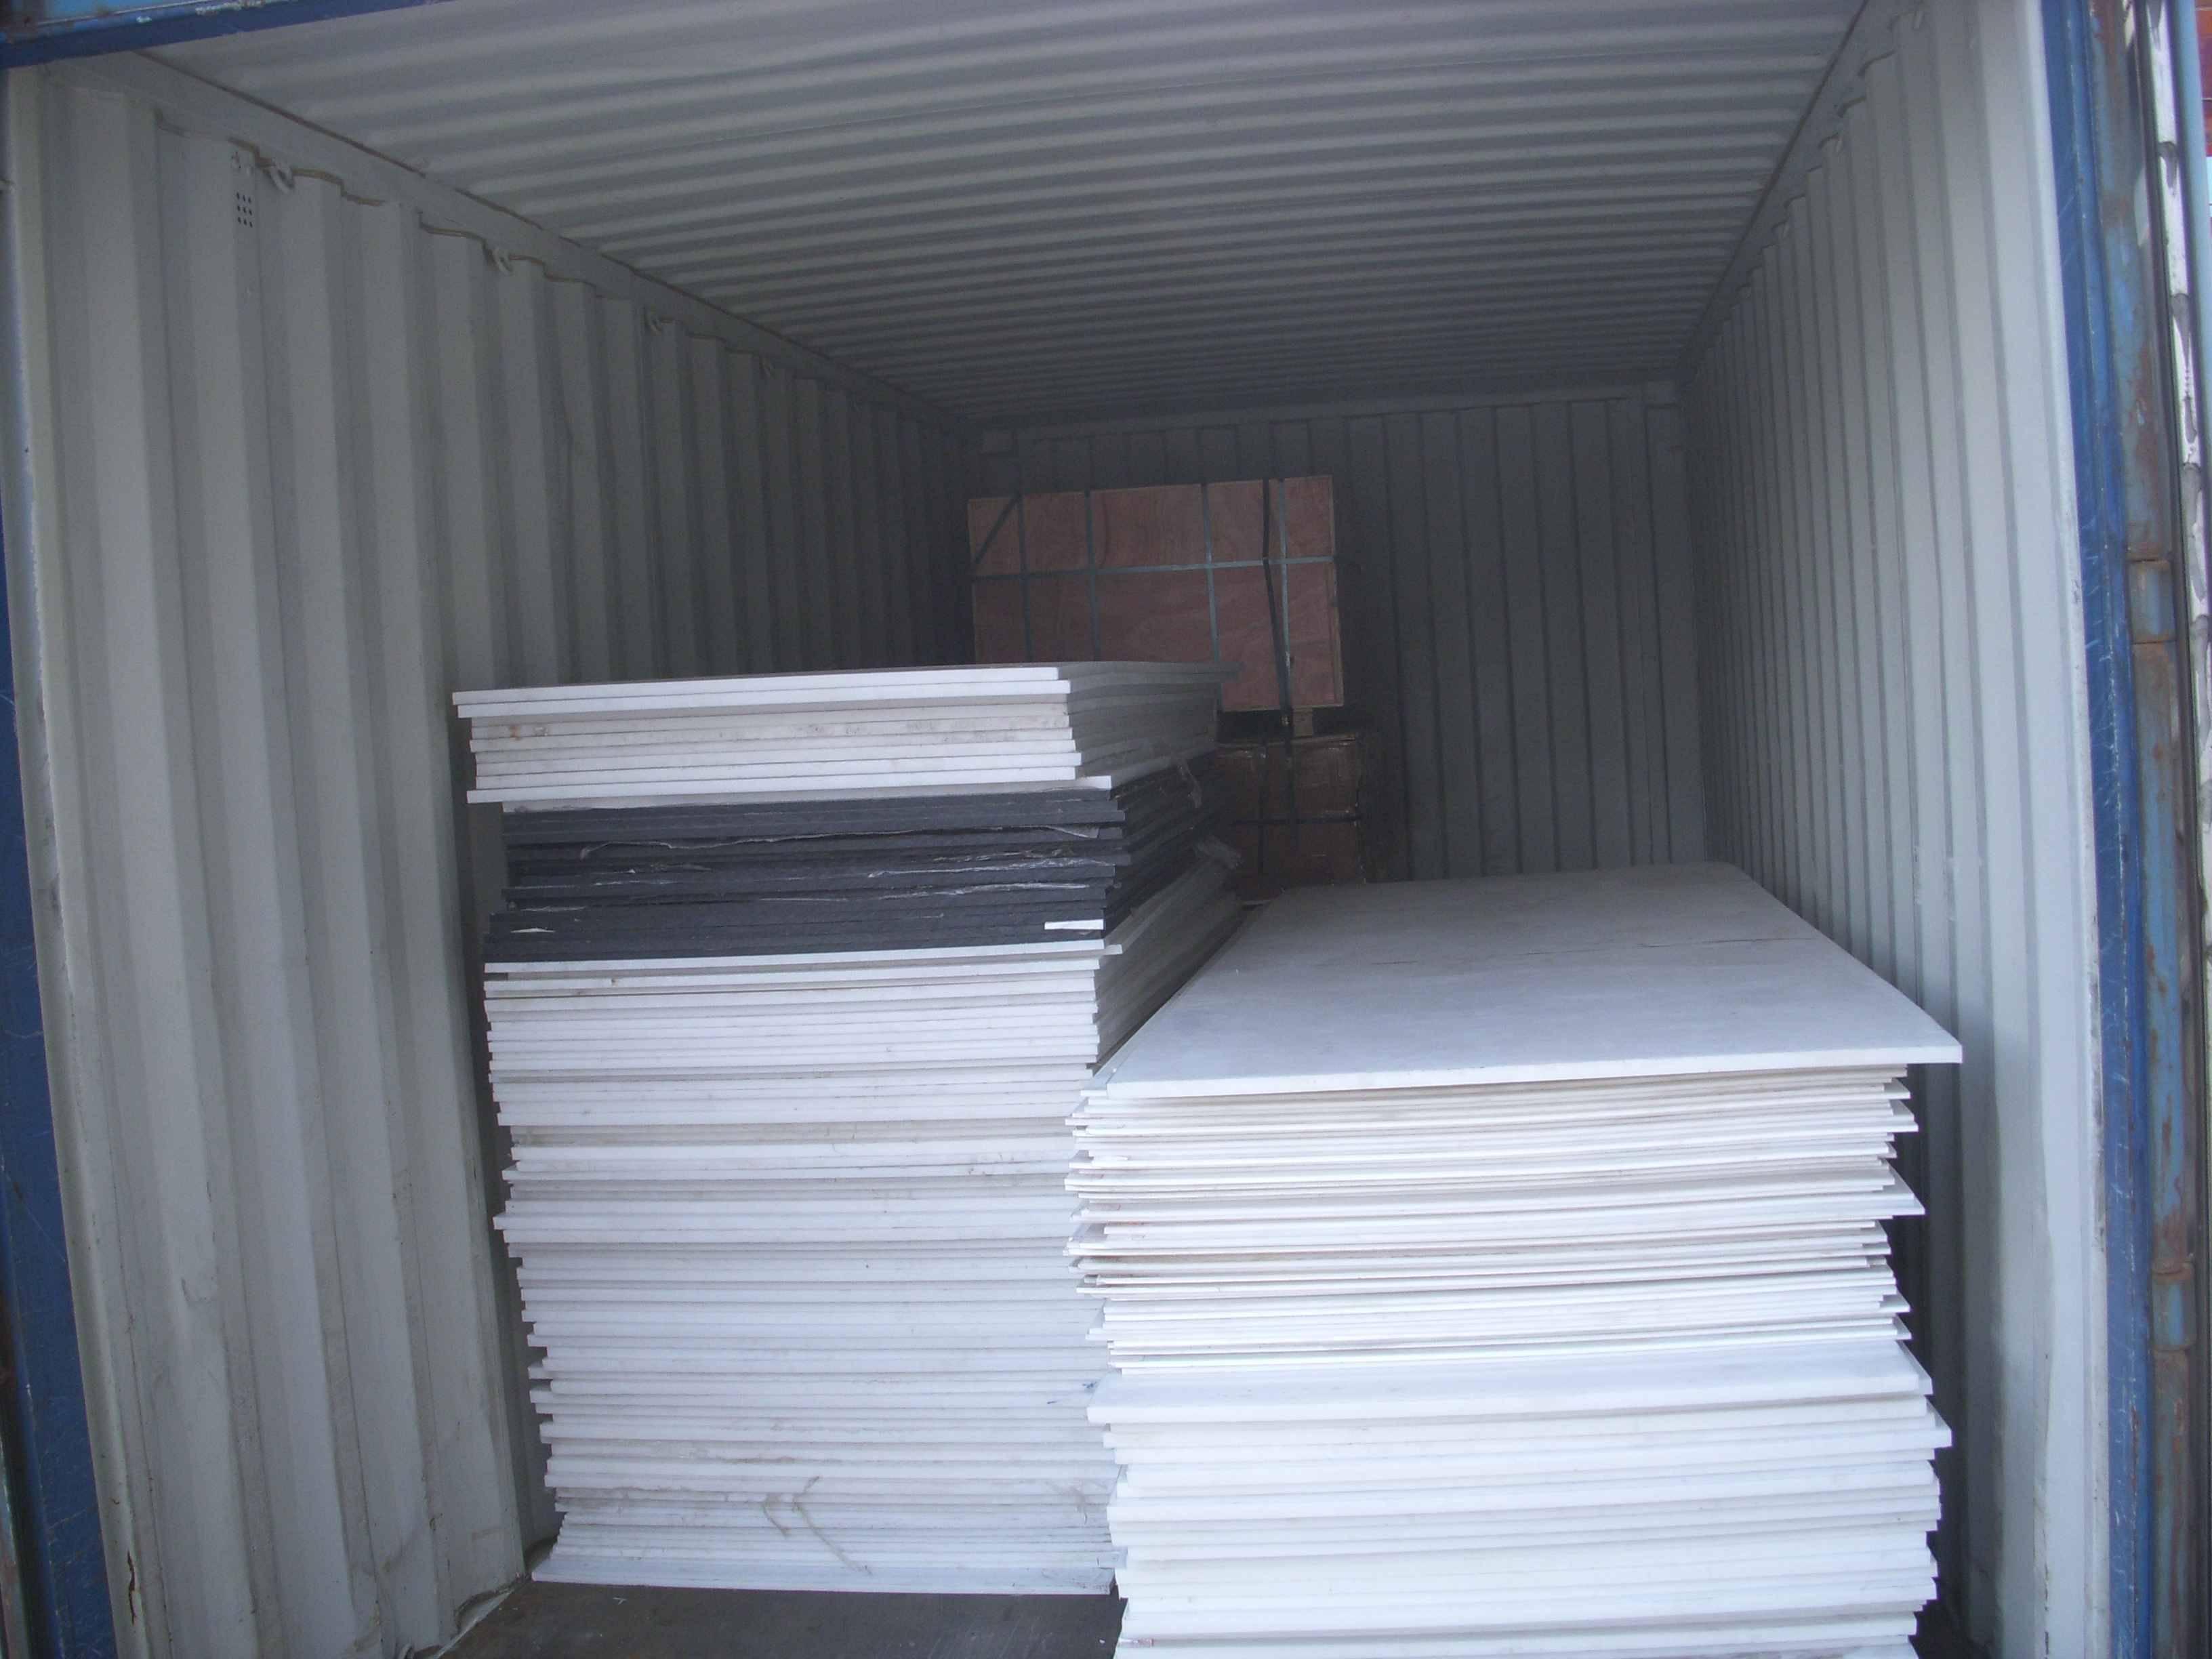 Electrical insulating rigid laminate sheet 3021, 3025, 3240, 3723, 3841,3026,325